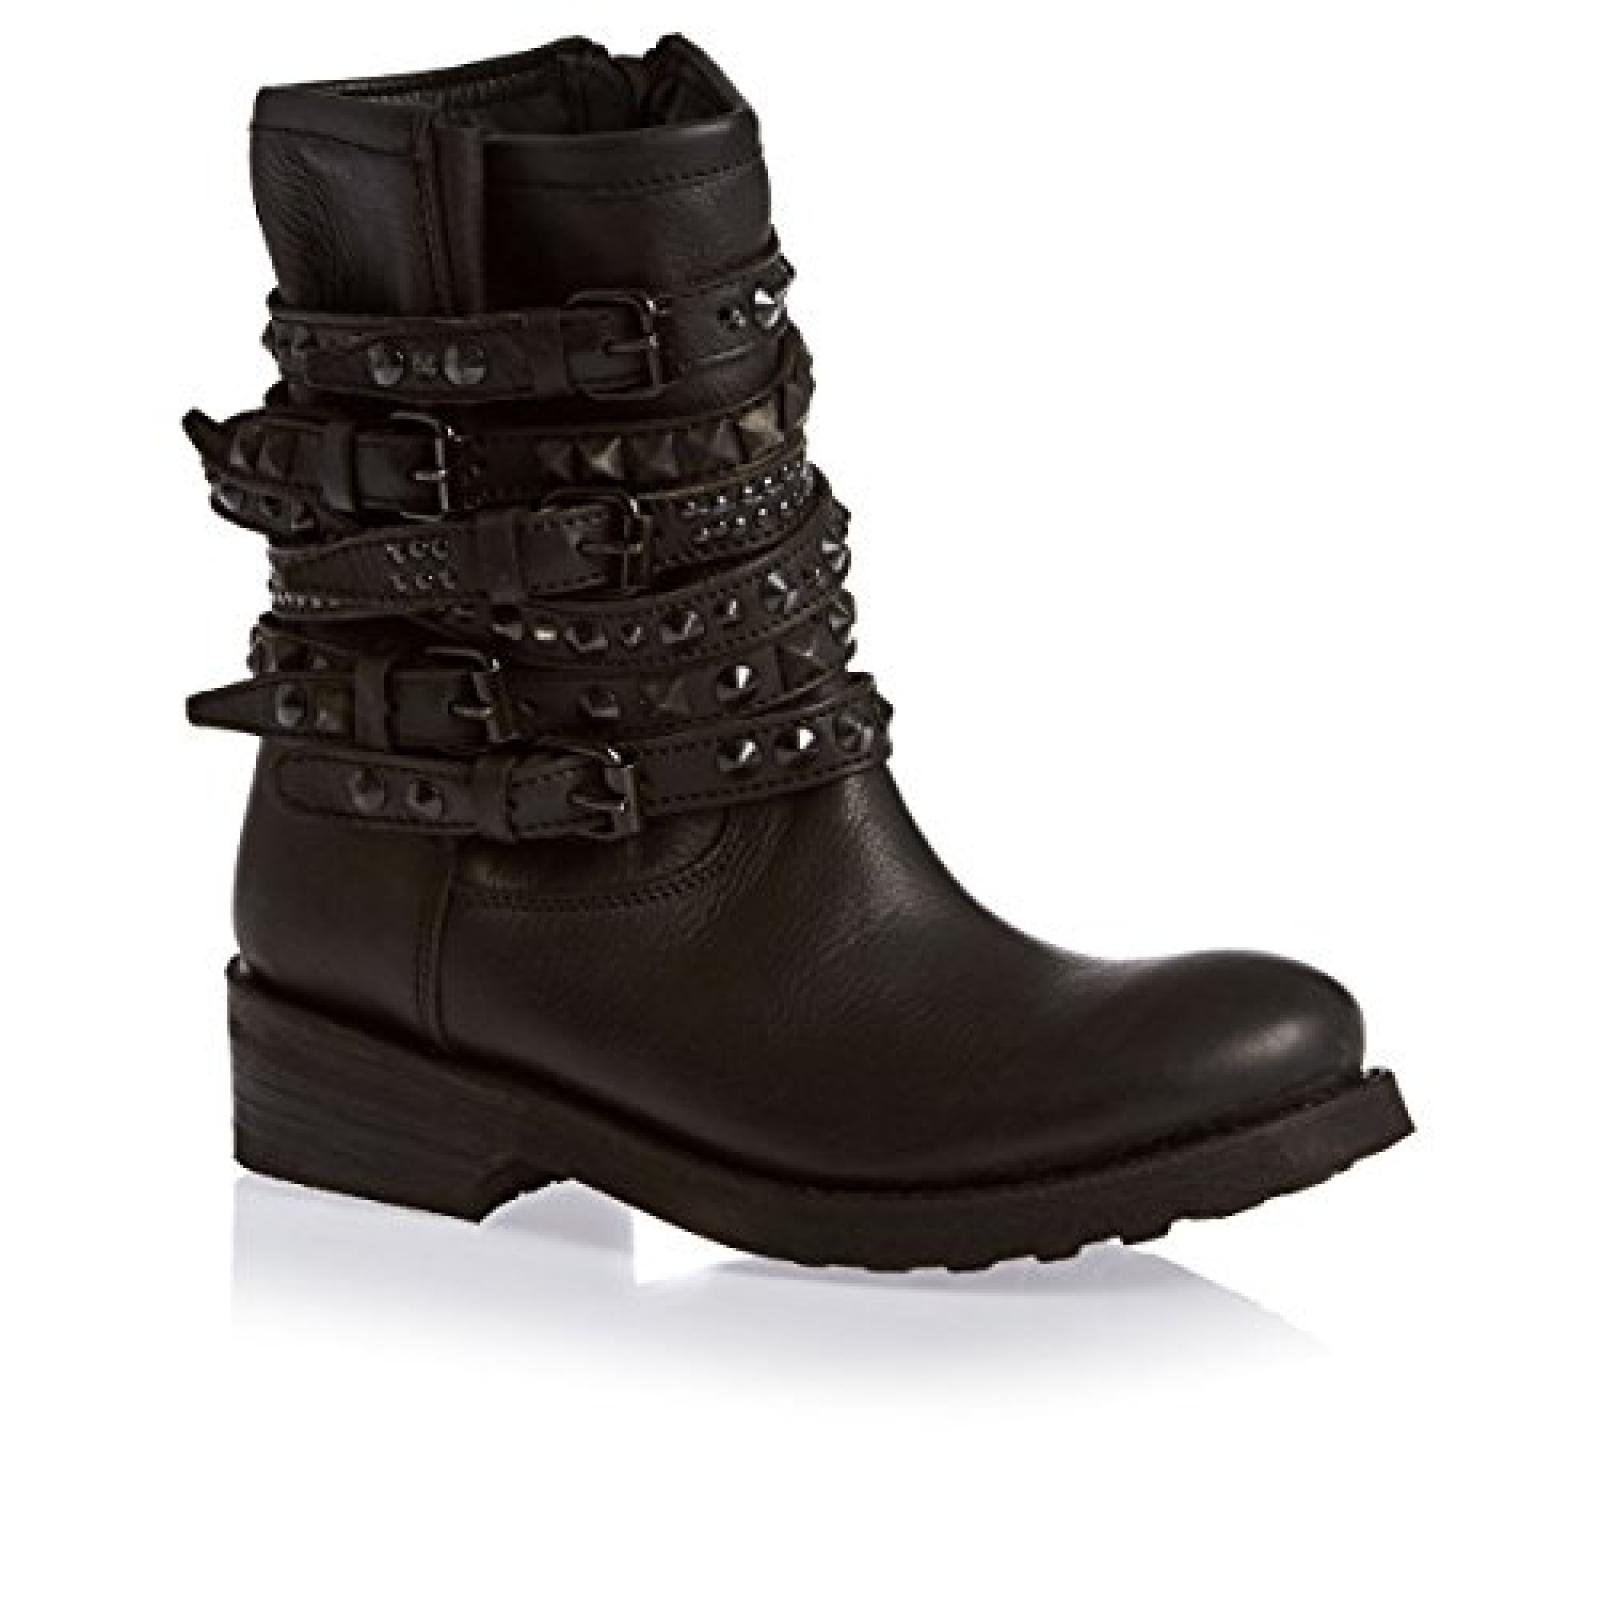 Ash Tempt Boots - Black